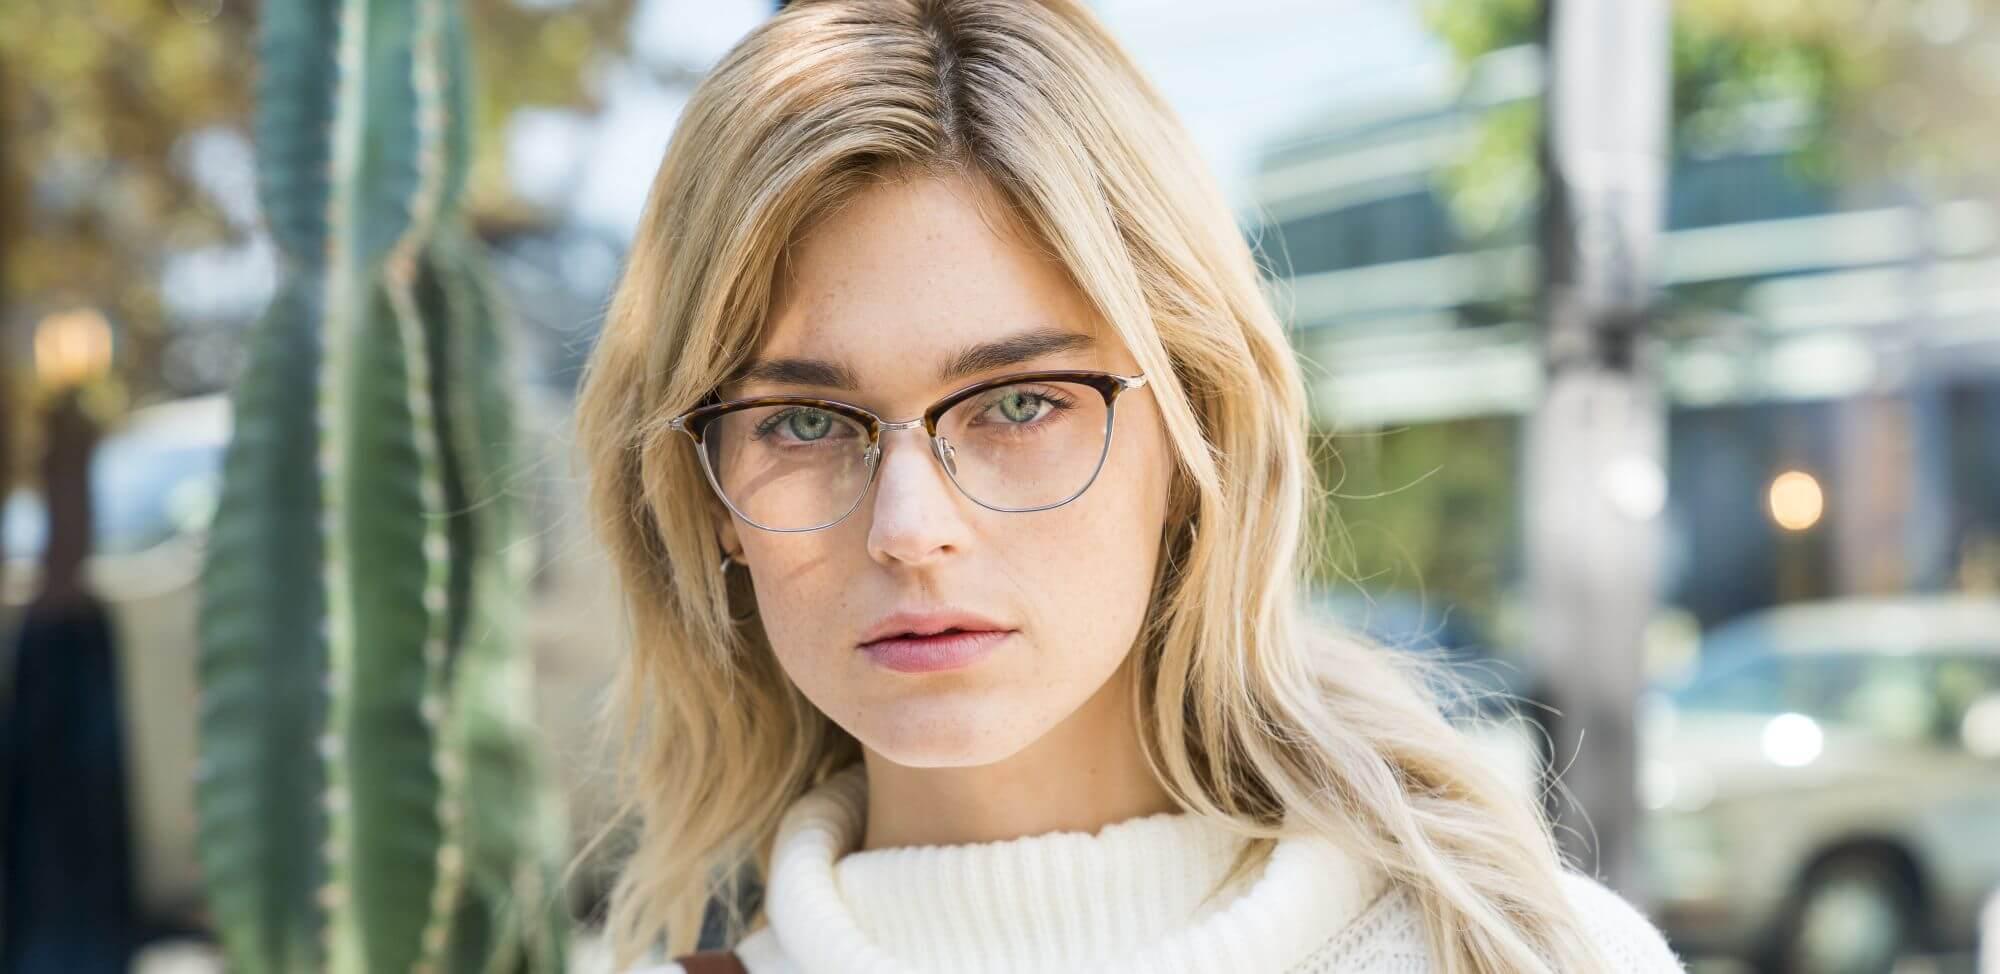 eyeglasses in Austin, Texas